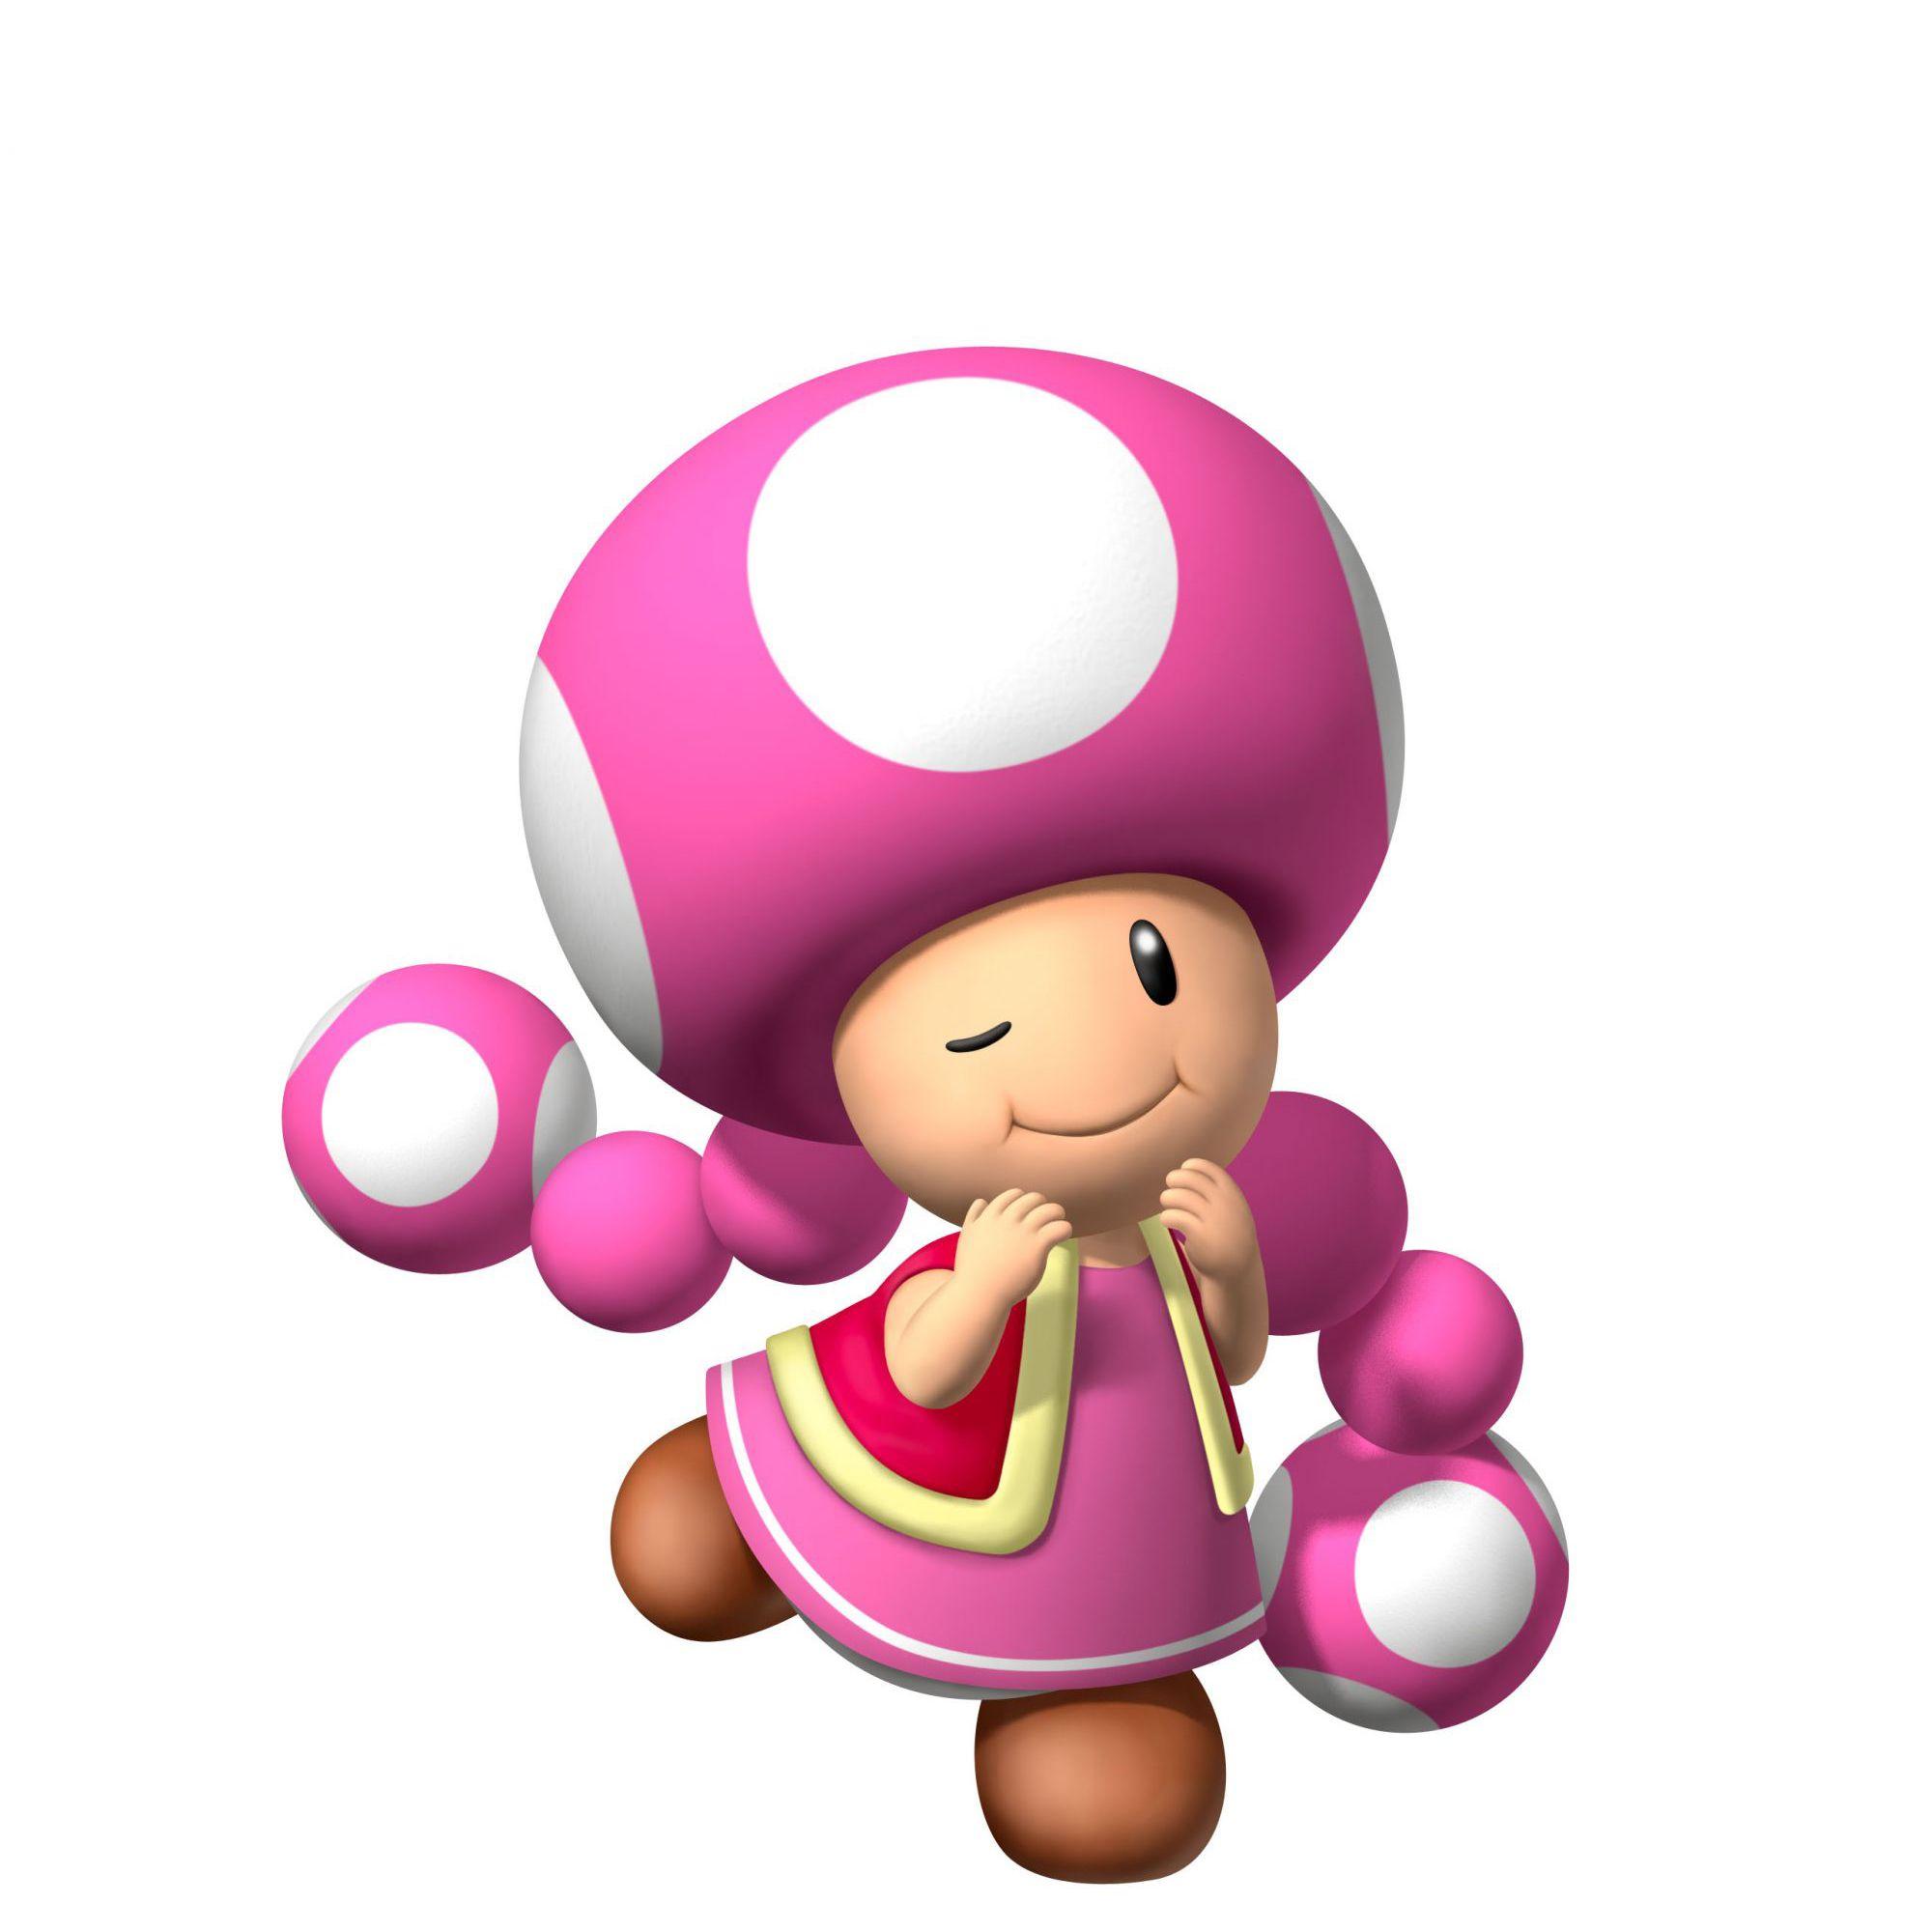 Pink Mushroom from nintendo games | Video Games | Pinterest | Mädchen